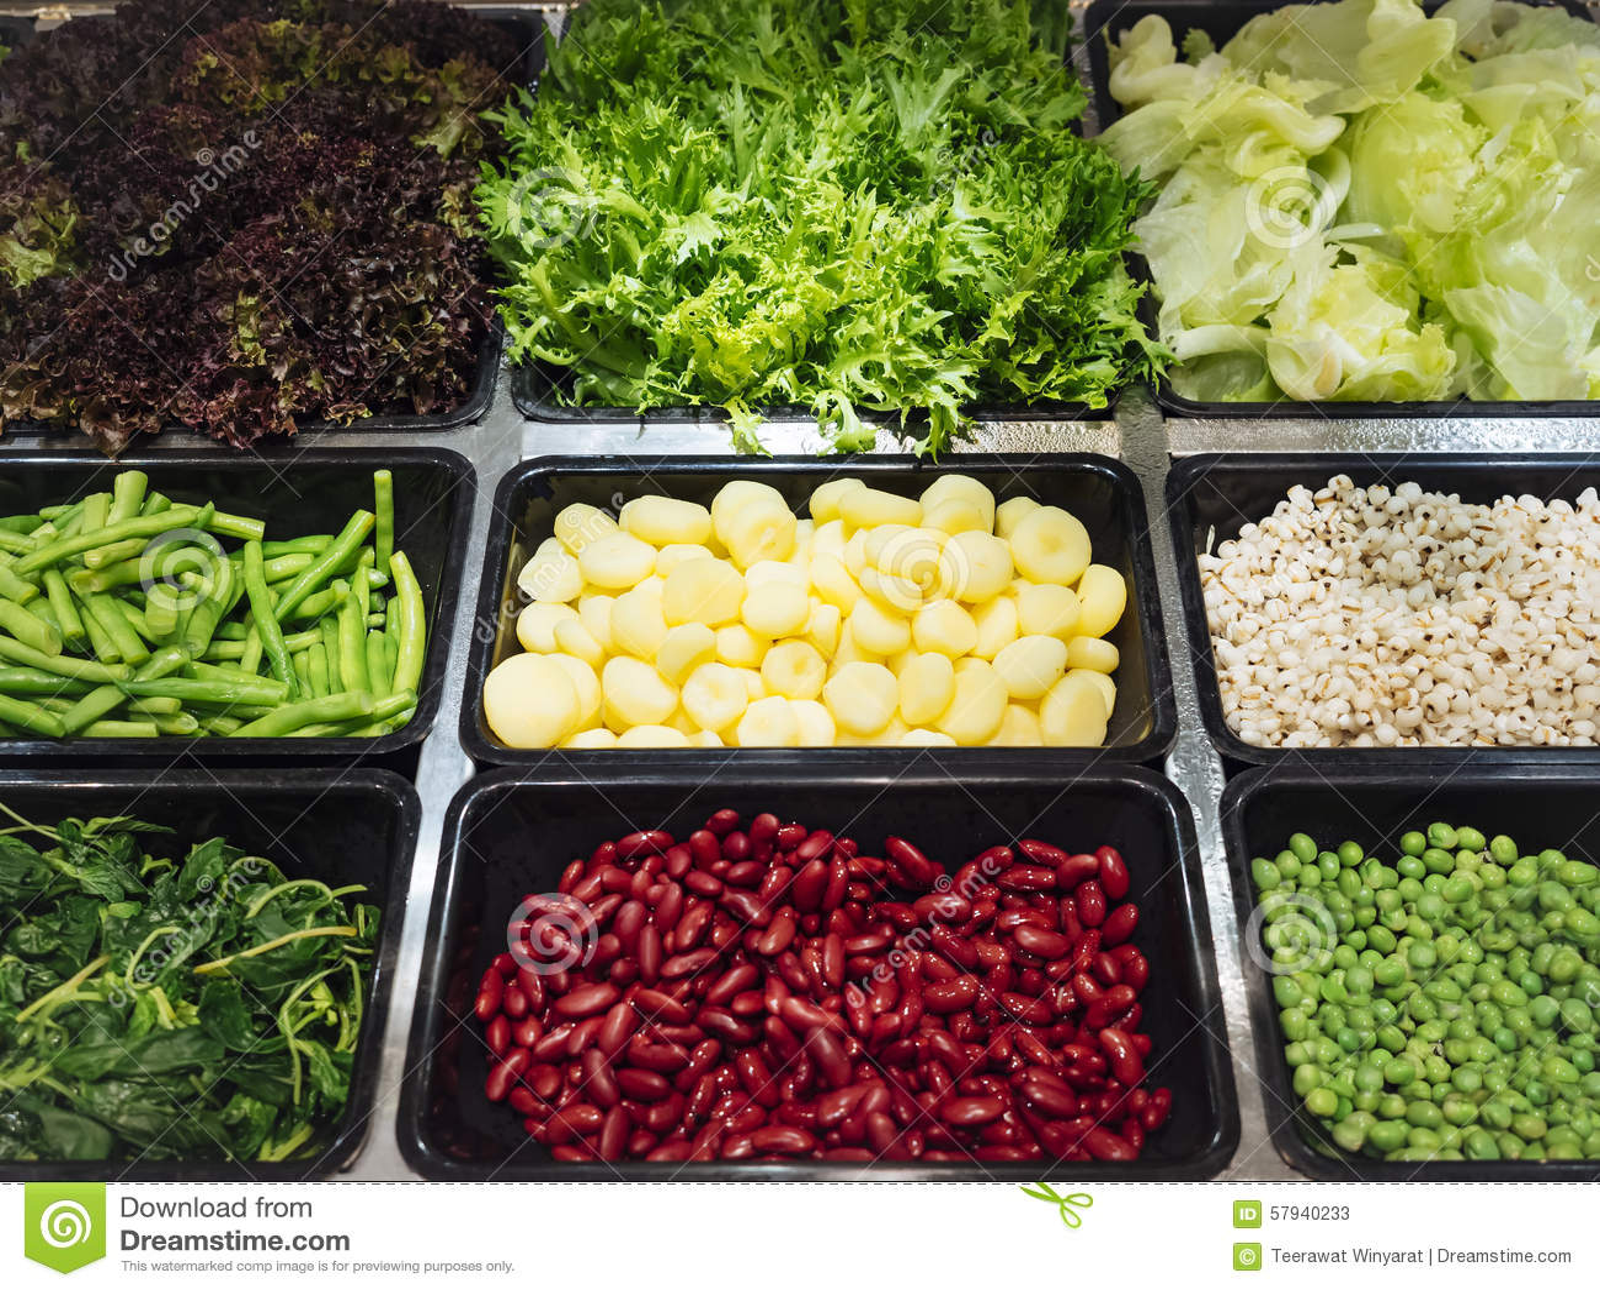 salad shop business plan